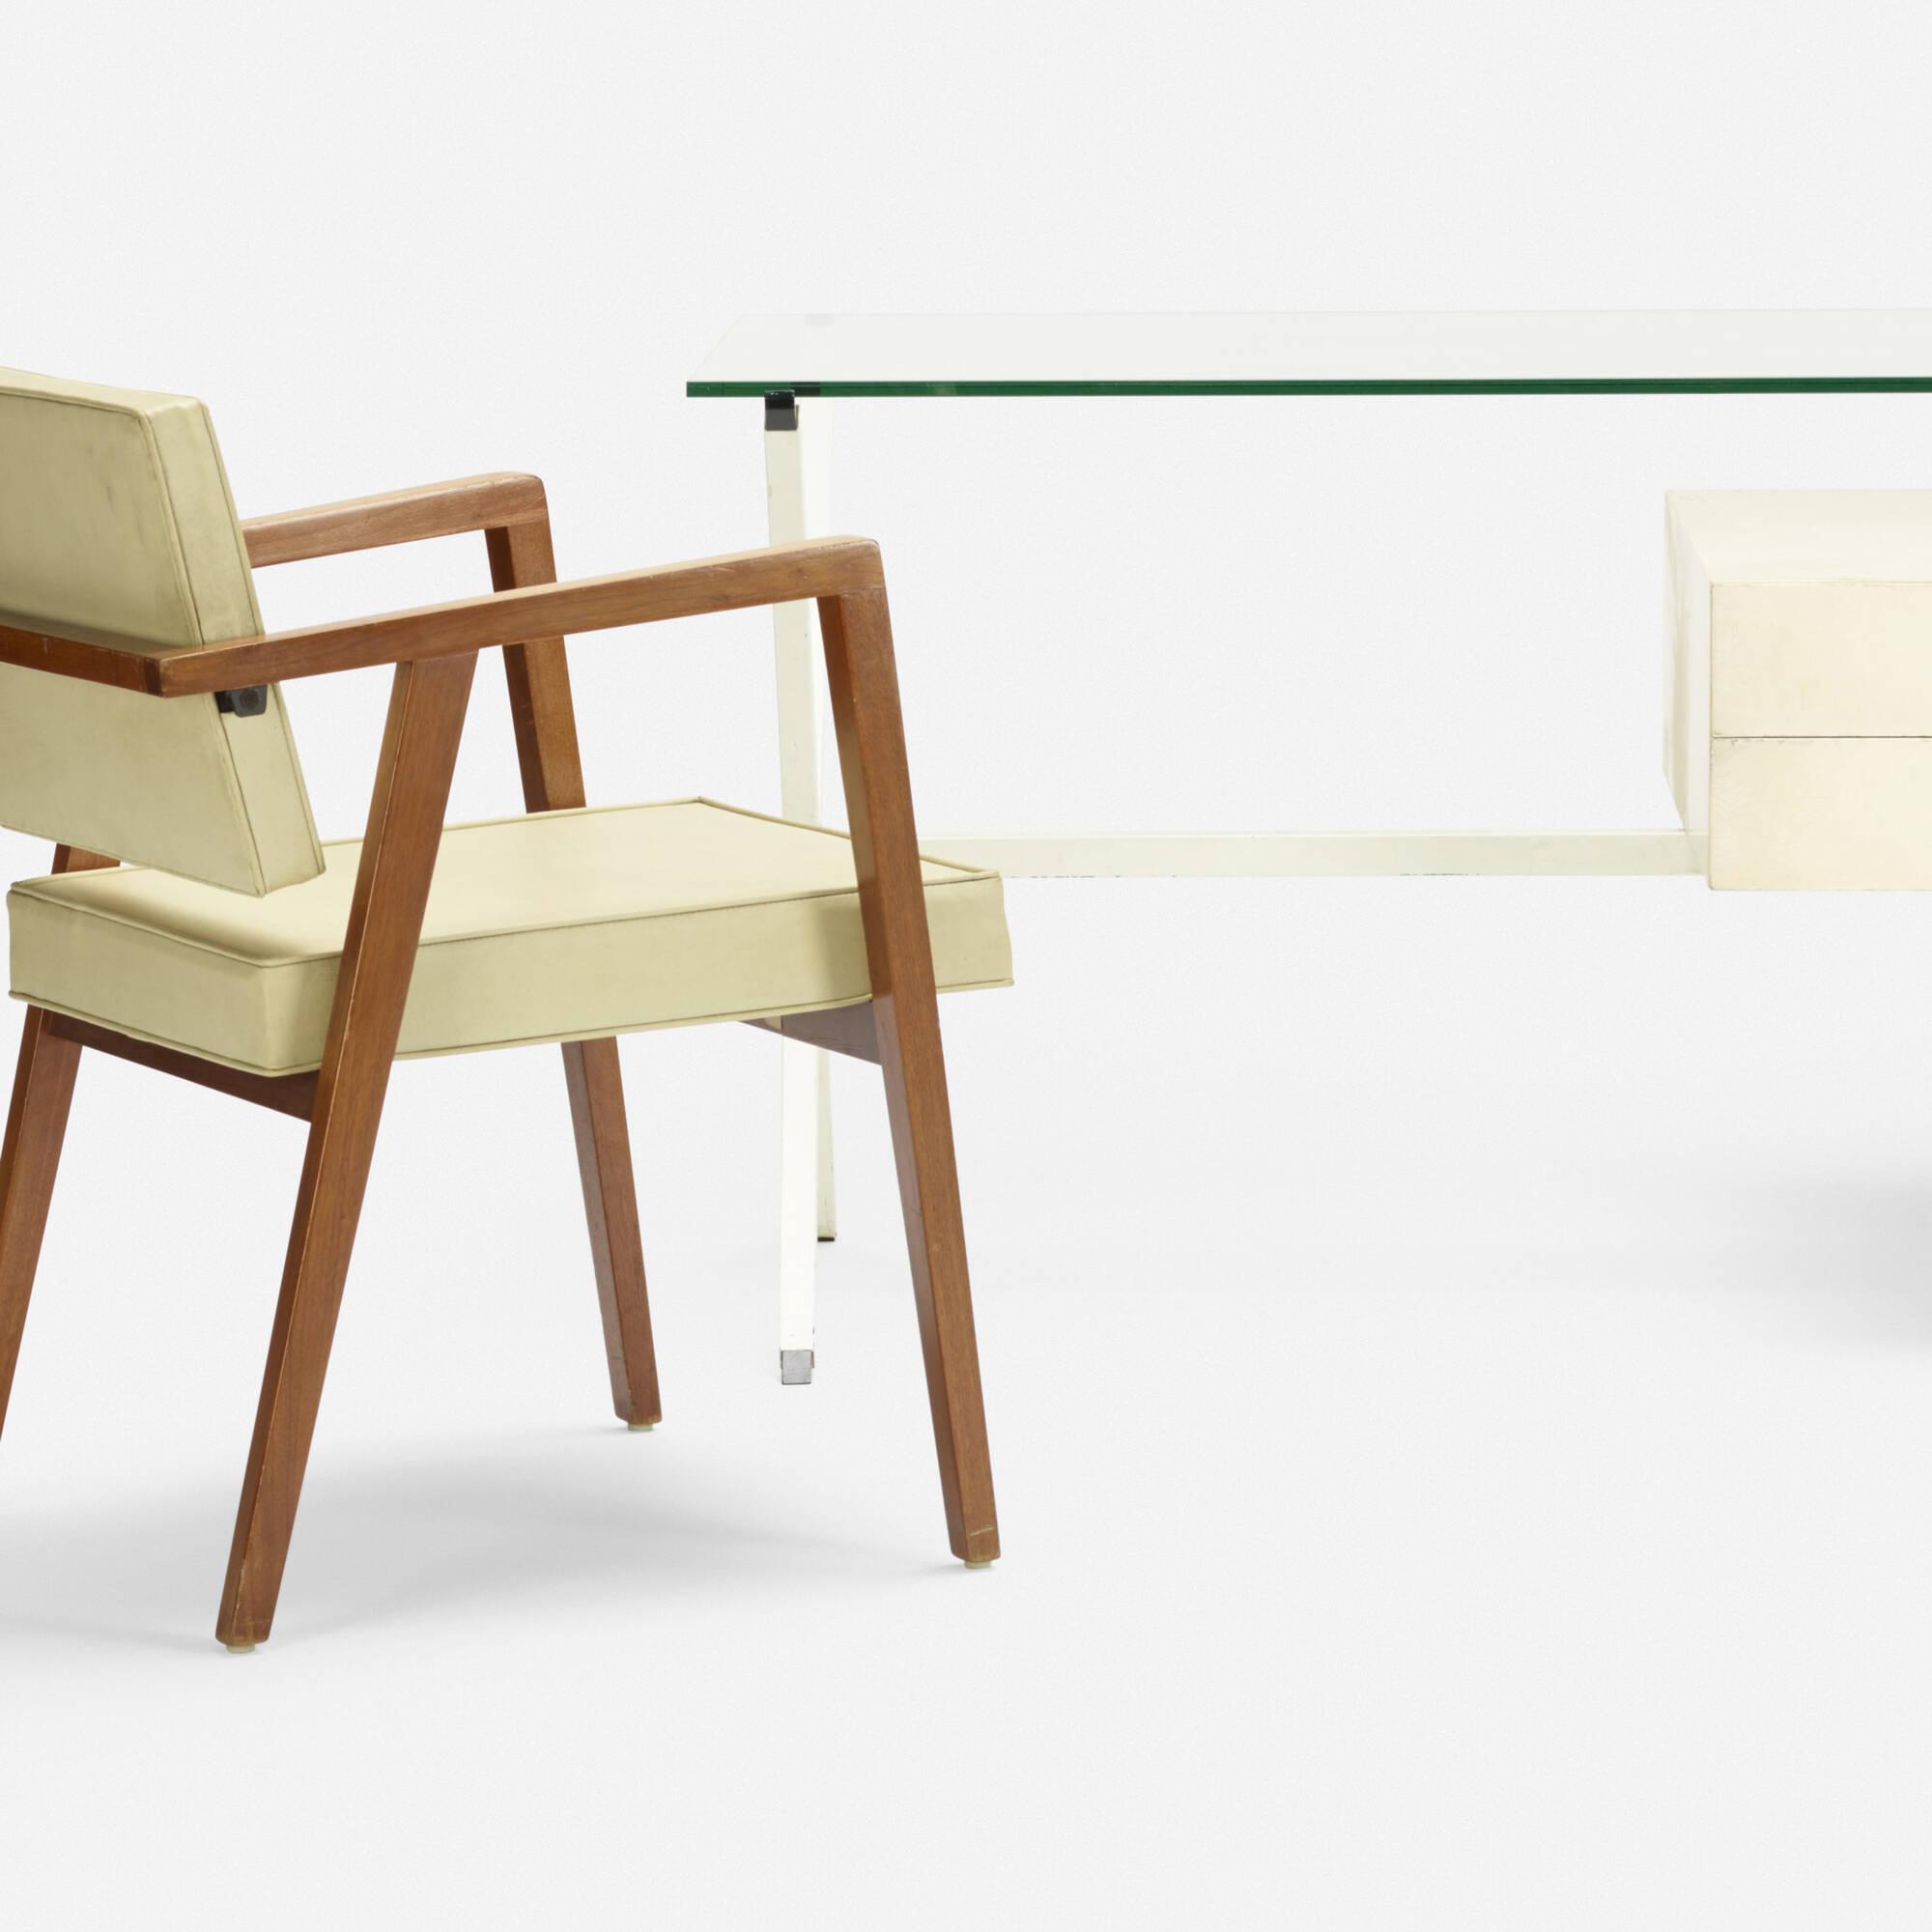 250: Franco Albini / desk, model 80 and armchair, model 48 (2 of 2)